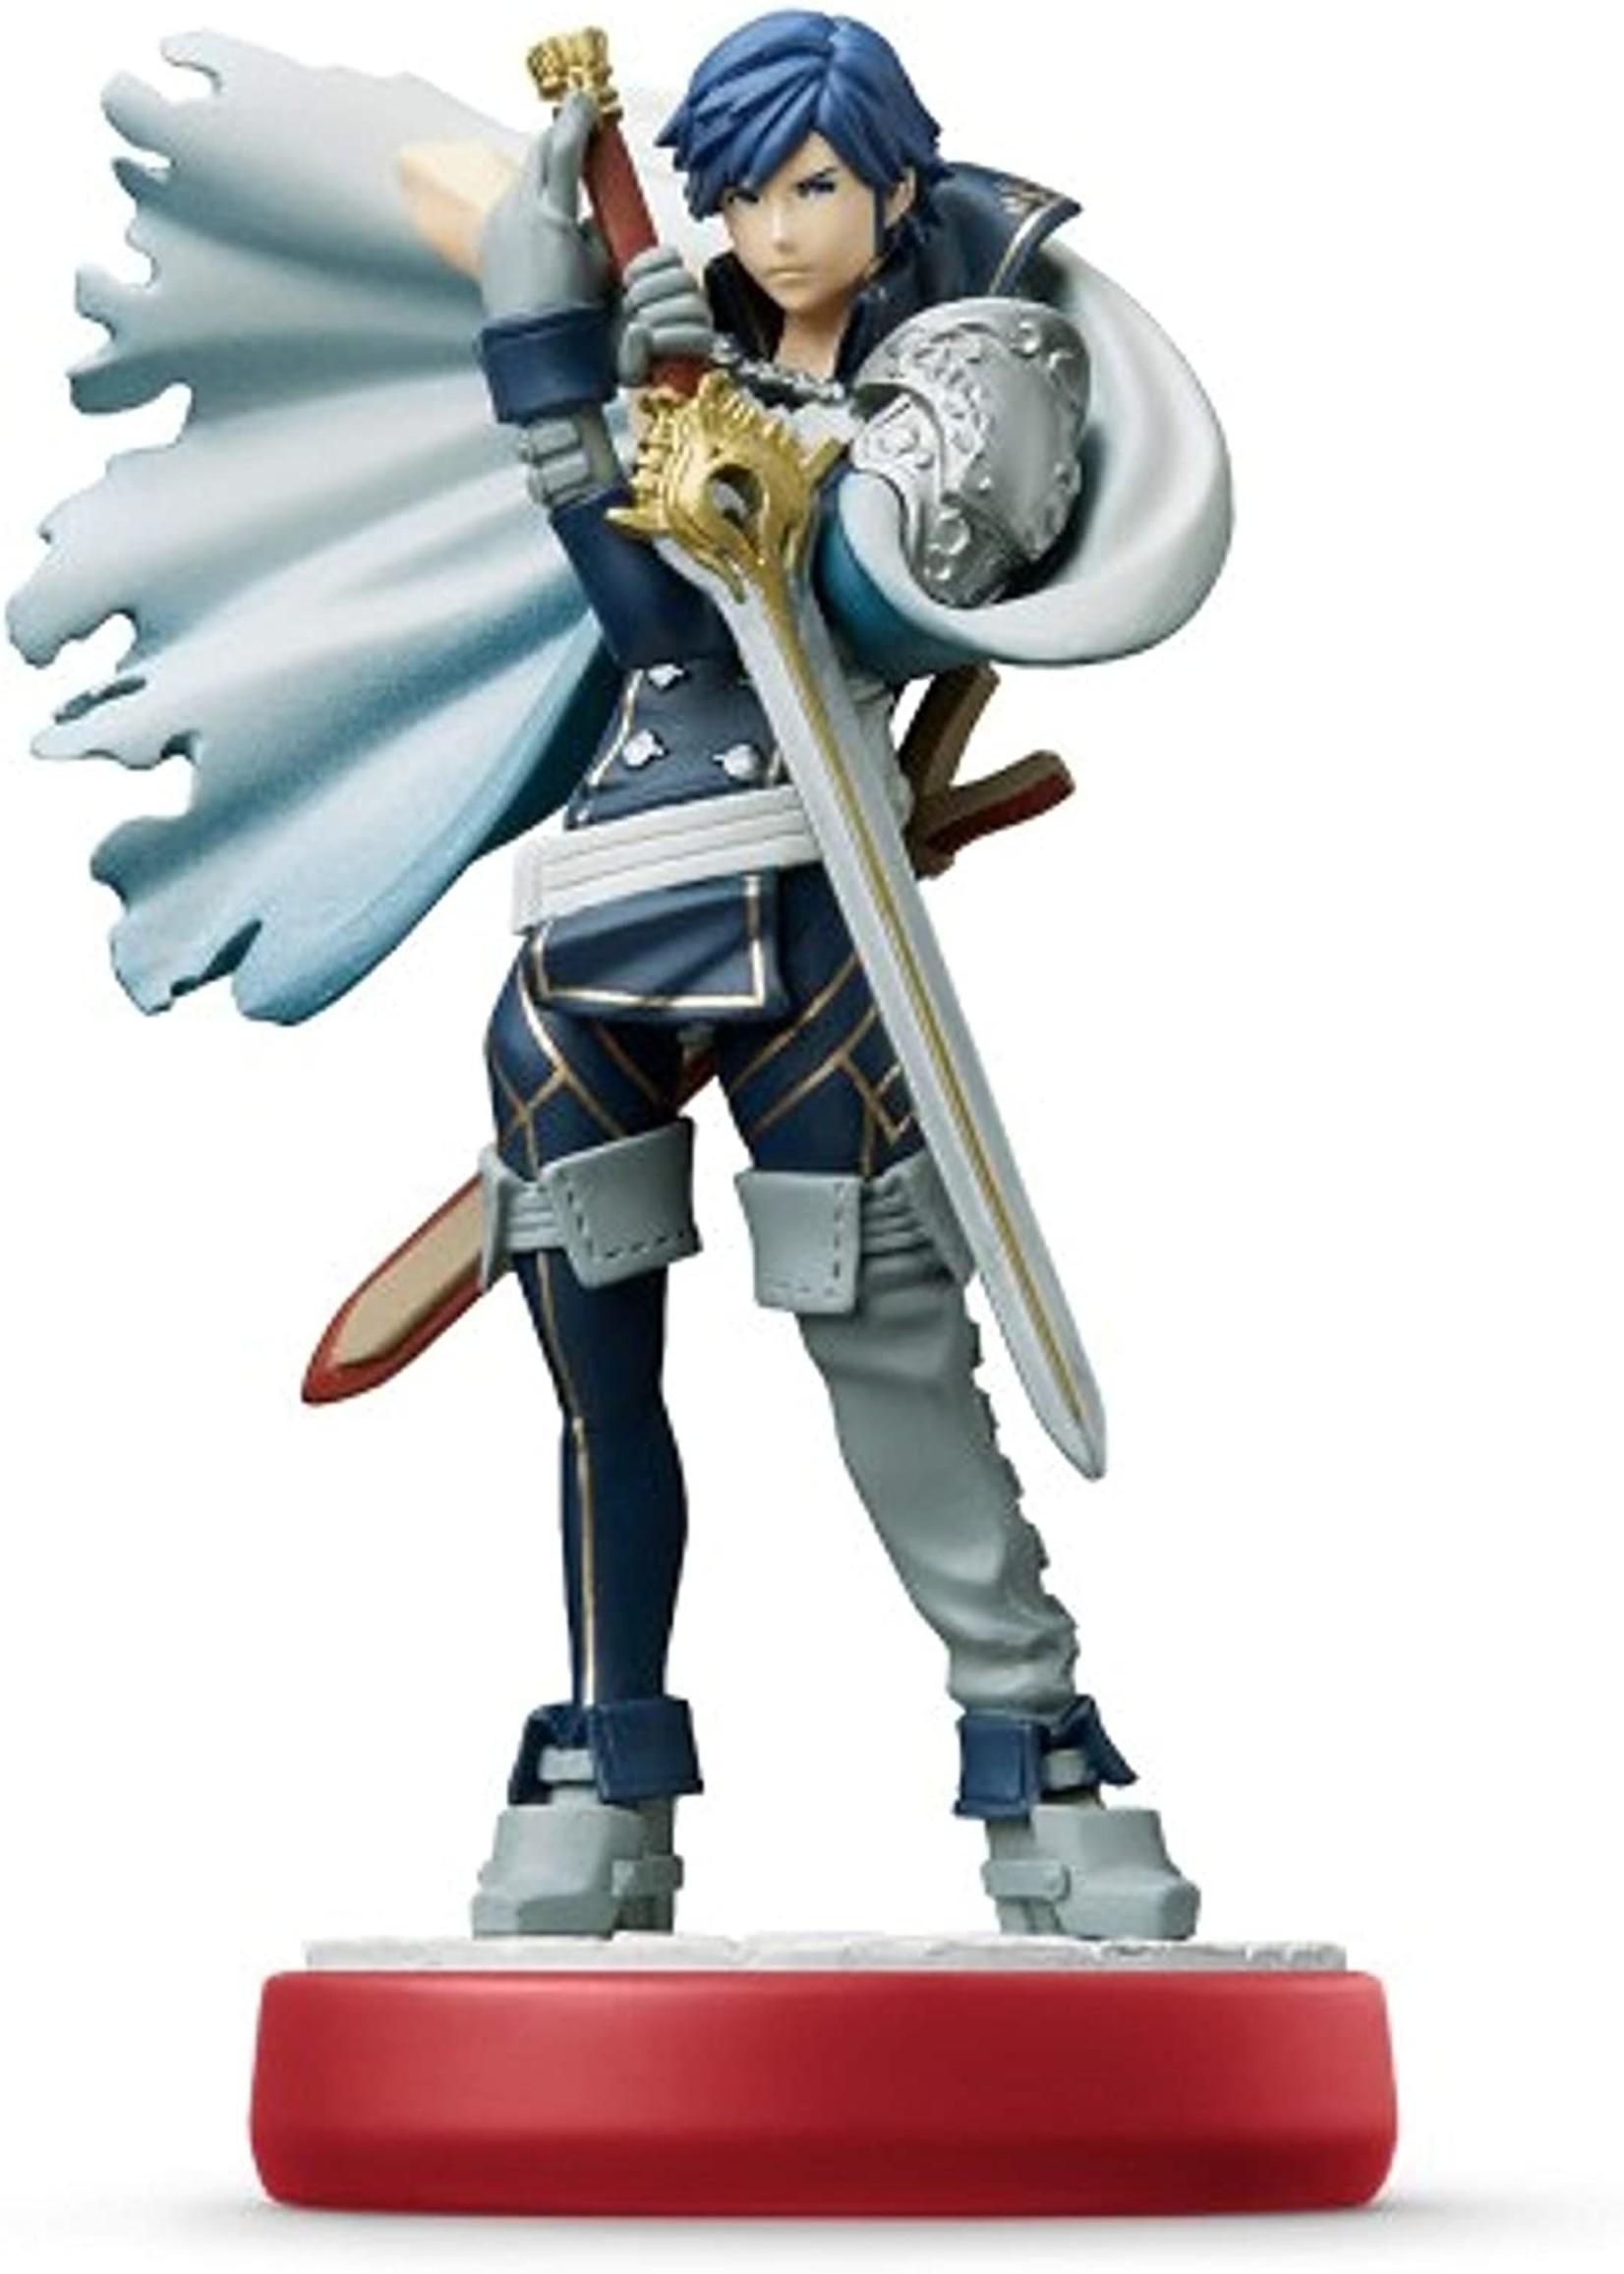 Nintendo Amiibo 'Collection Fire Emblem' - Chrom